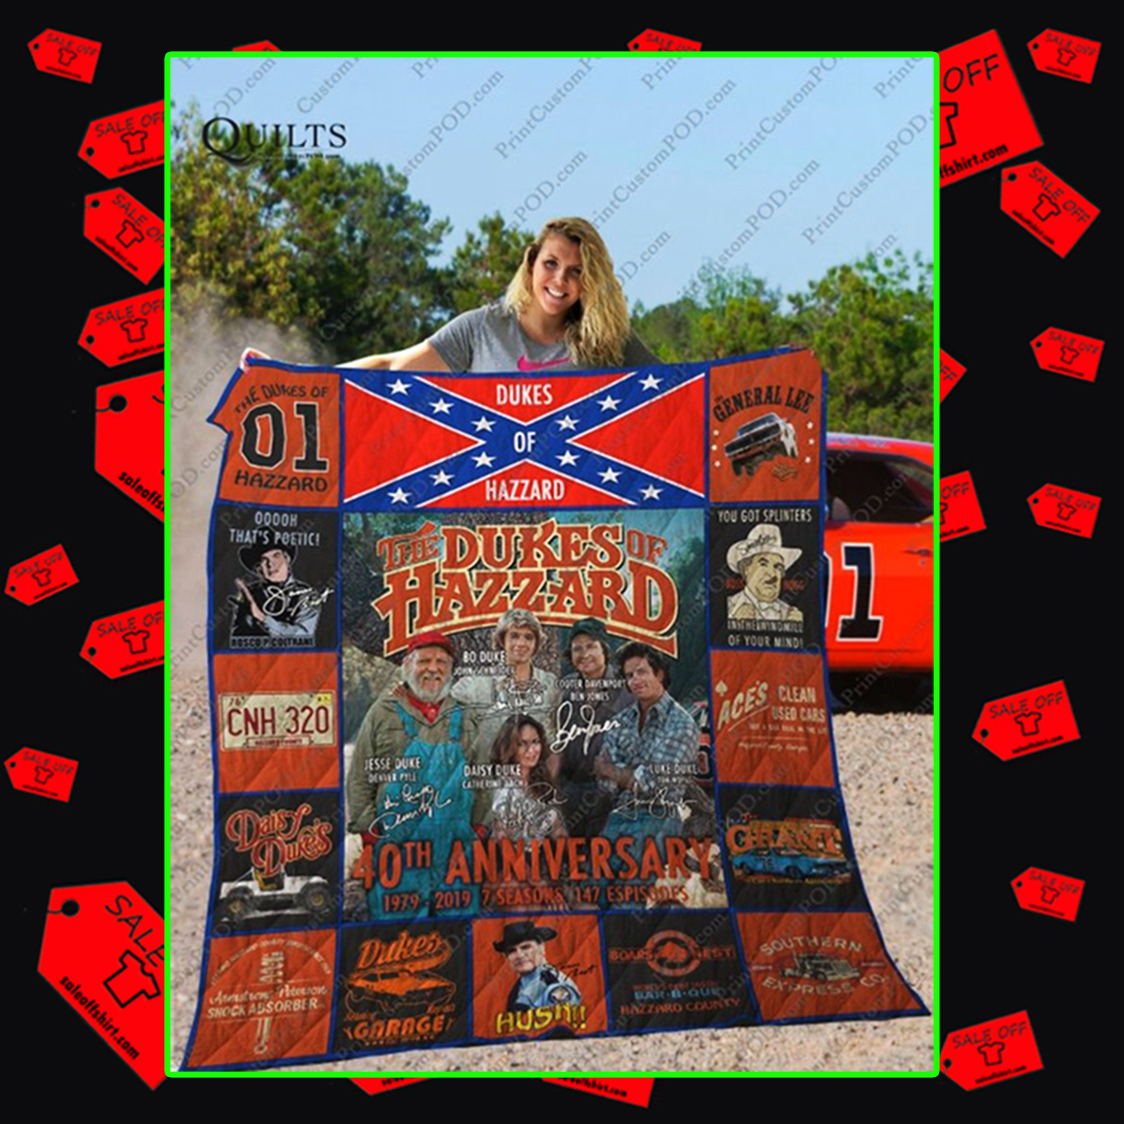 The Dukes of Hazzard 40th Anniversary Signature Quilt Blanket